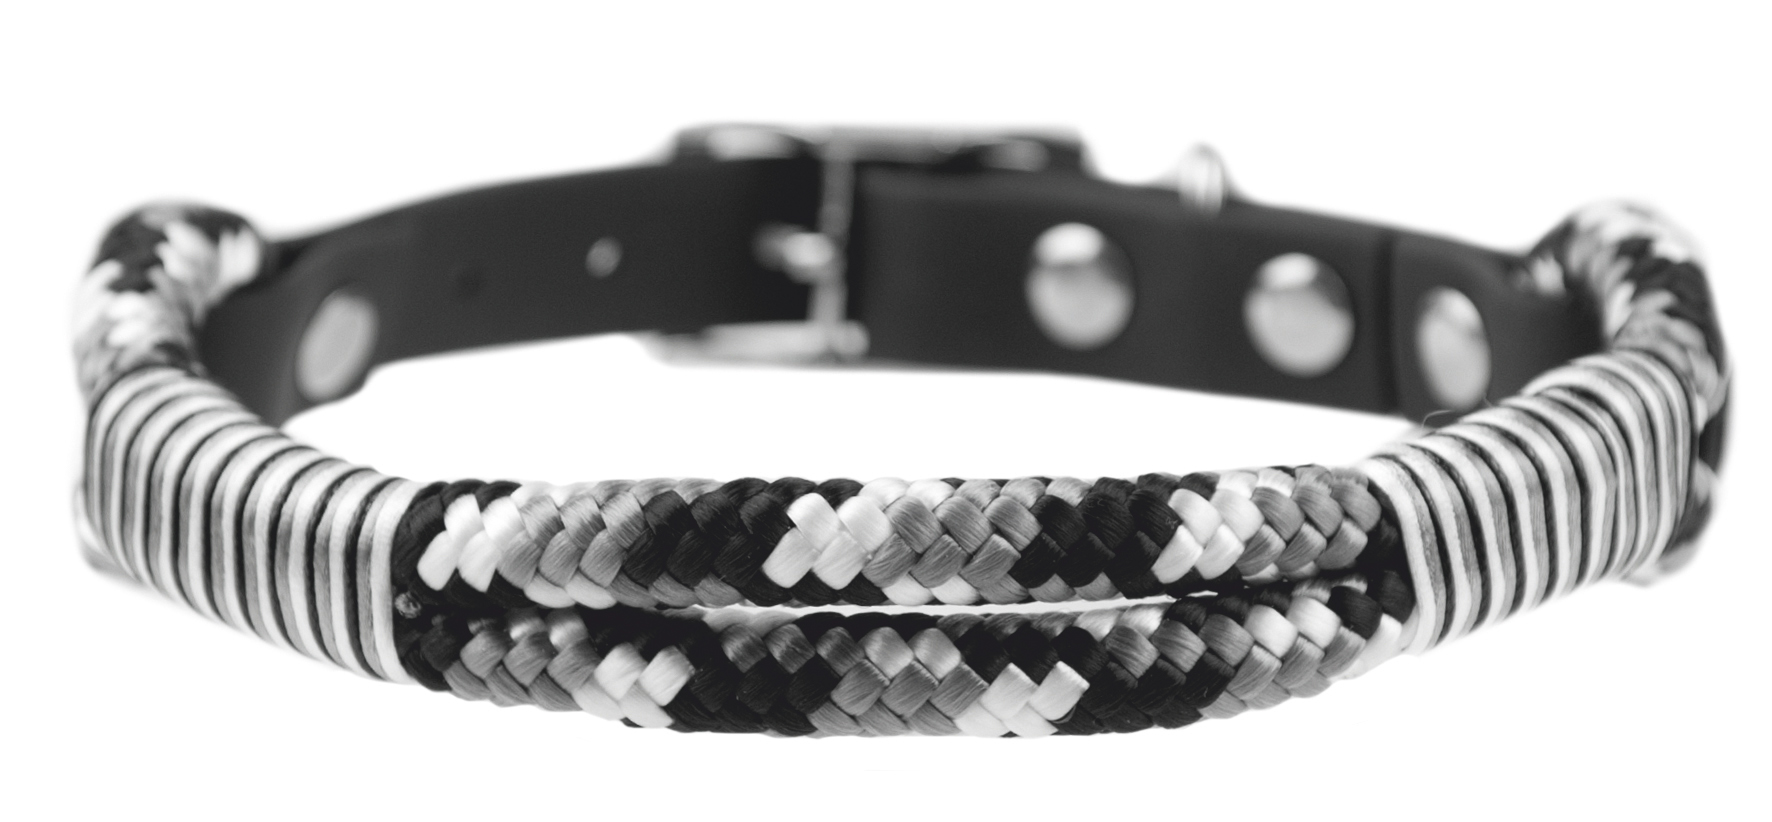 Emmy & Pepe Halsband ohne Perlen Steelhead